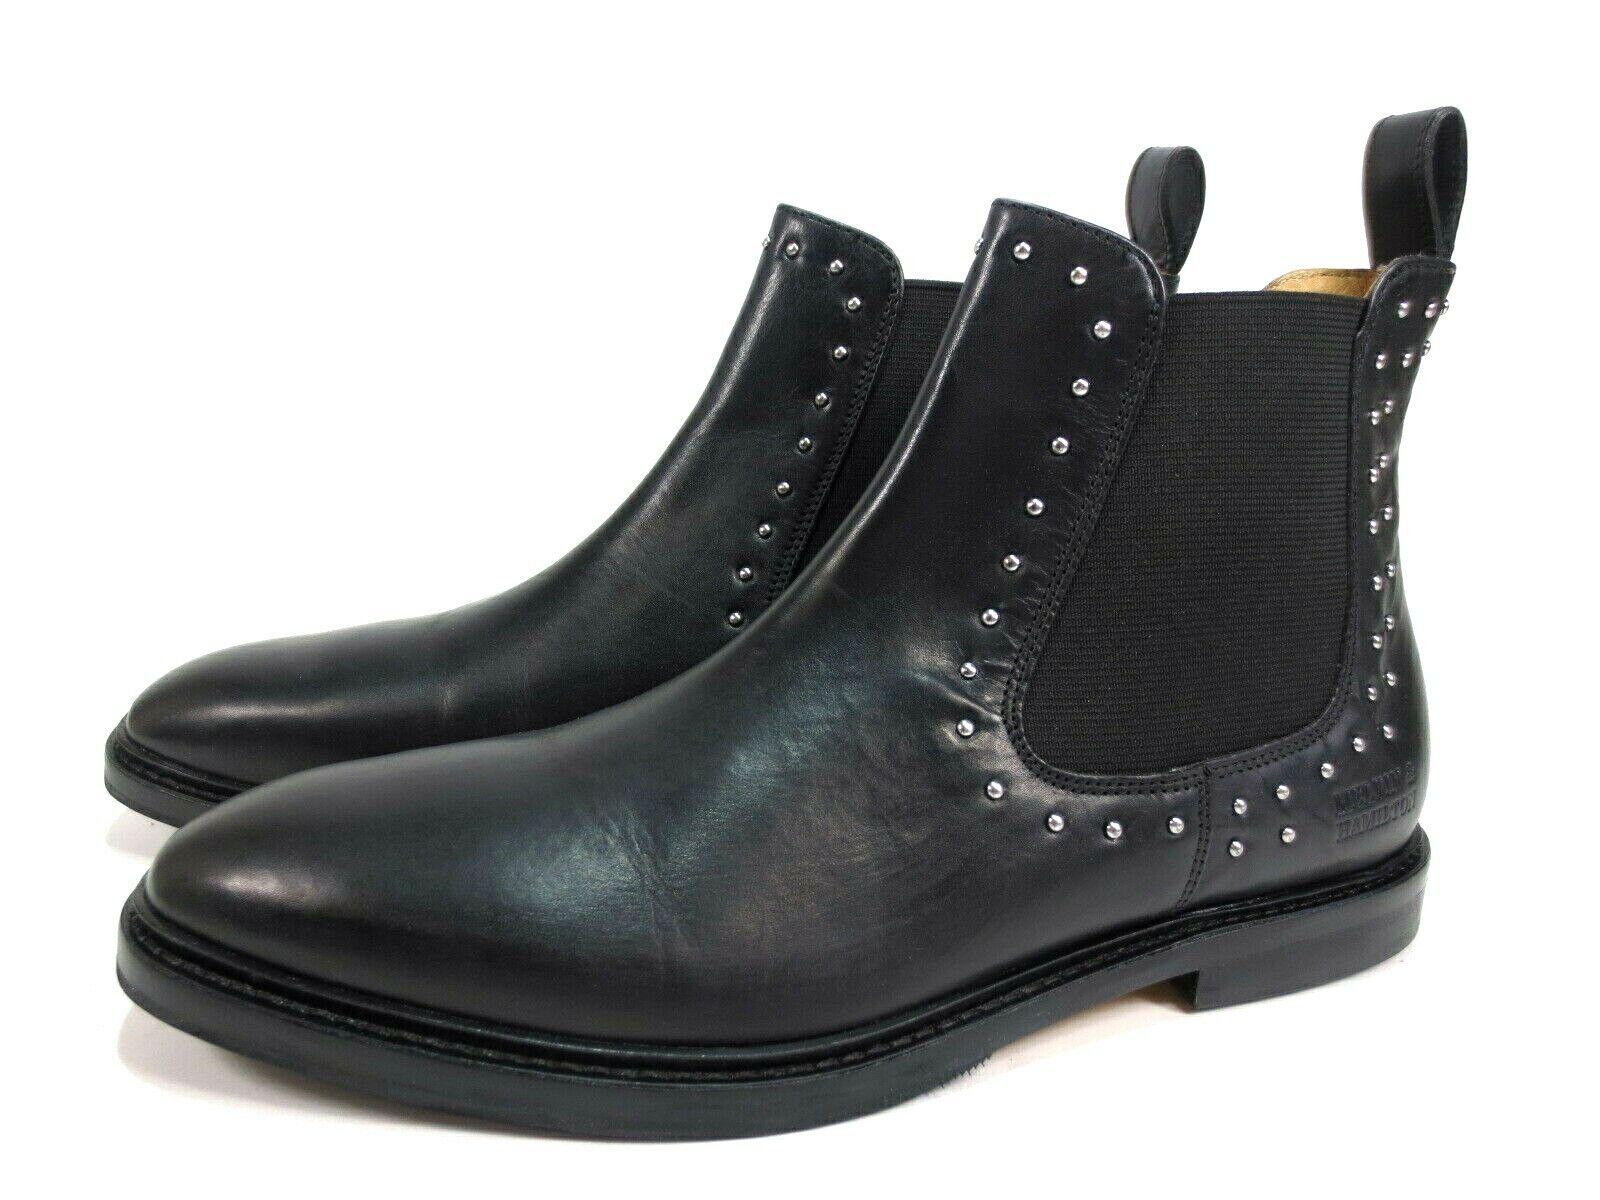 MELVIN HAMILTON Katrin Chelsea Stiefel Leder Schuhe Stiefeletten Gr. 41 NEU